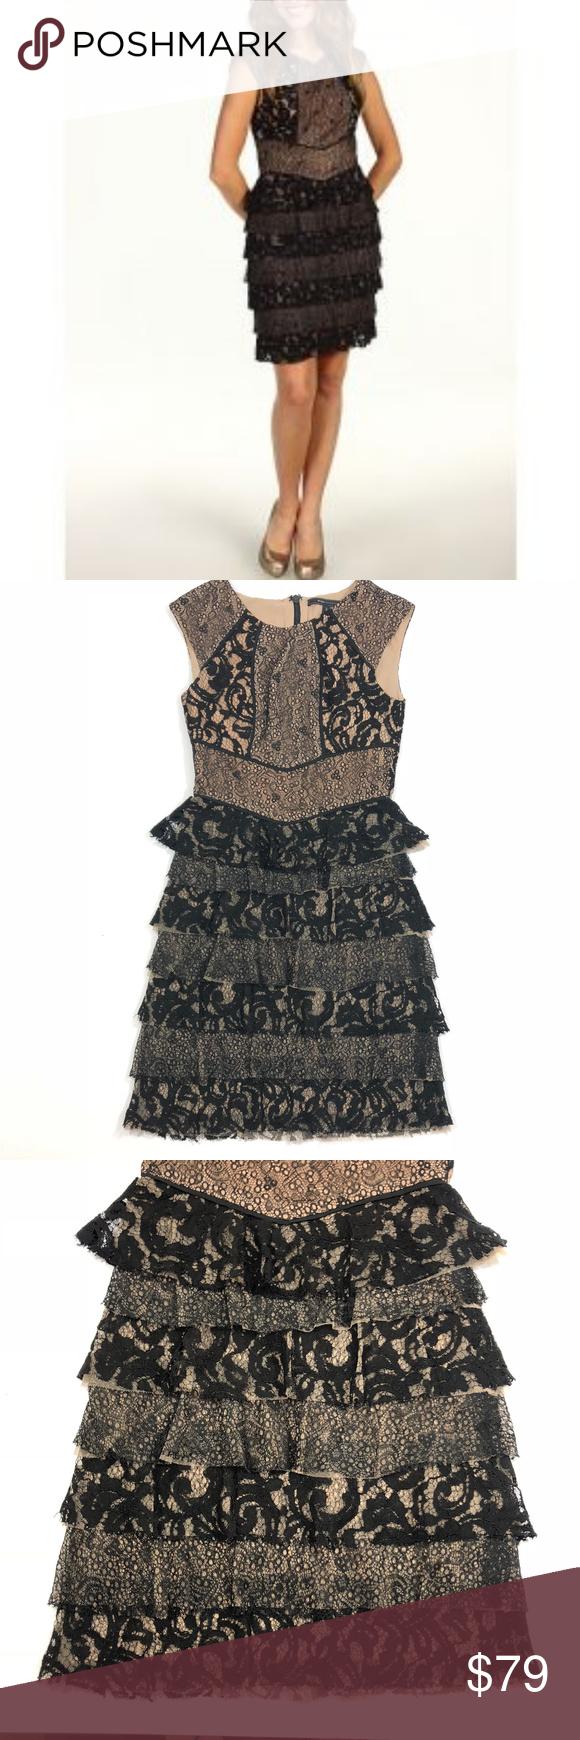 Bcbgmaxazria Black Cream Lace Tiered Ruffle Dress Tiered Ruffle Dress Dresses Bcbgmaxazria Dresses [ 1740 x 580 Pixel ]